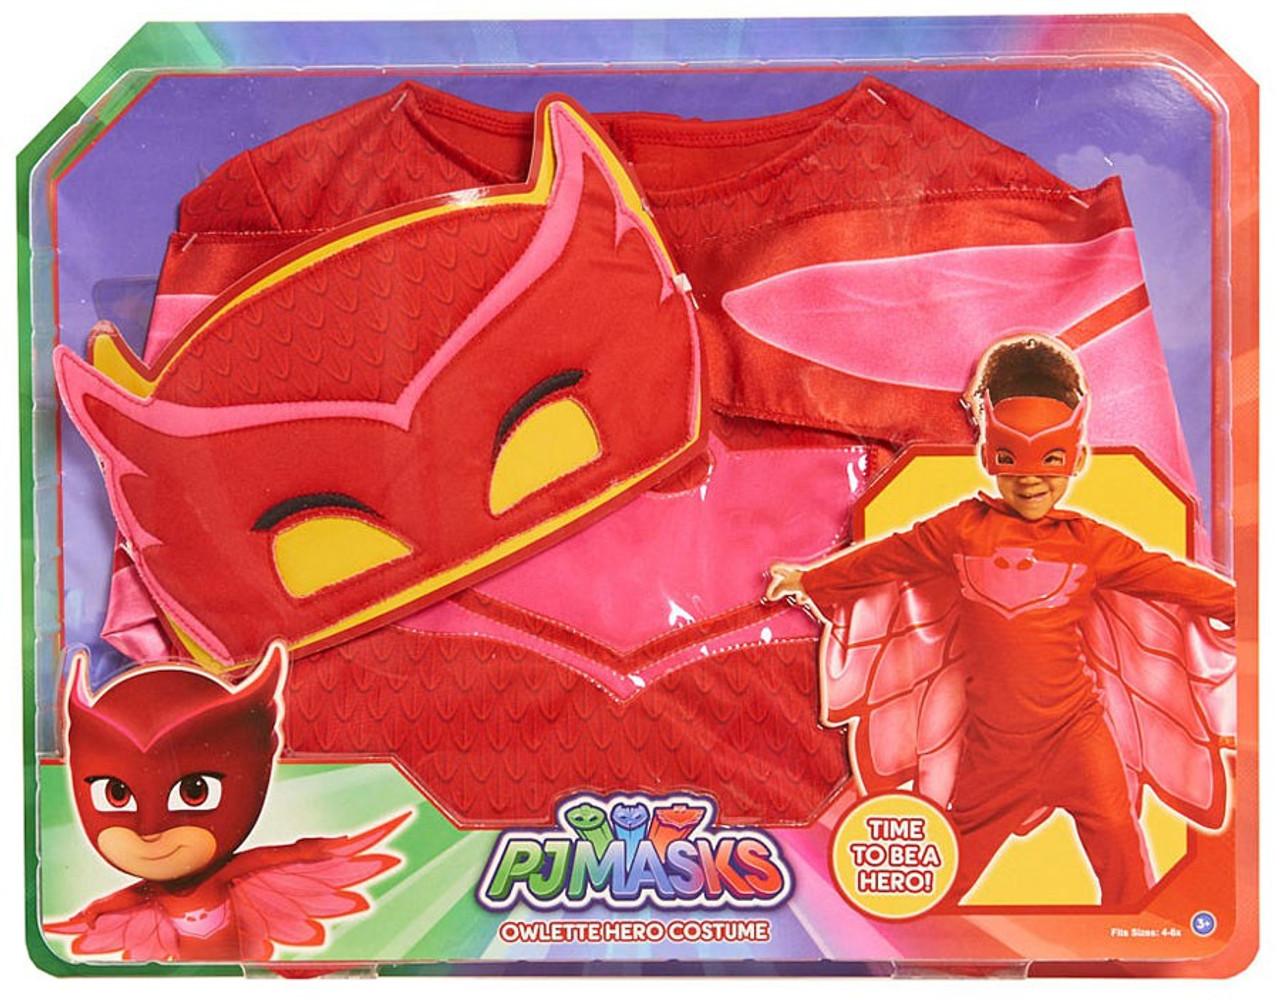 Disney Junior Pj Masks Owlette Costume 4 6x Just Play Toywiz